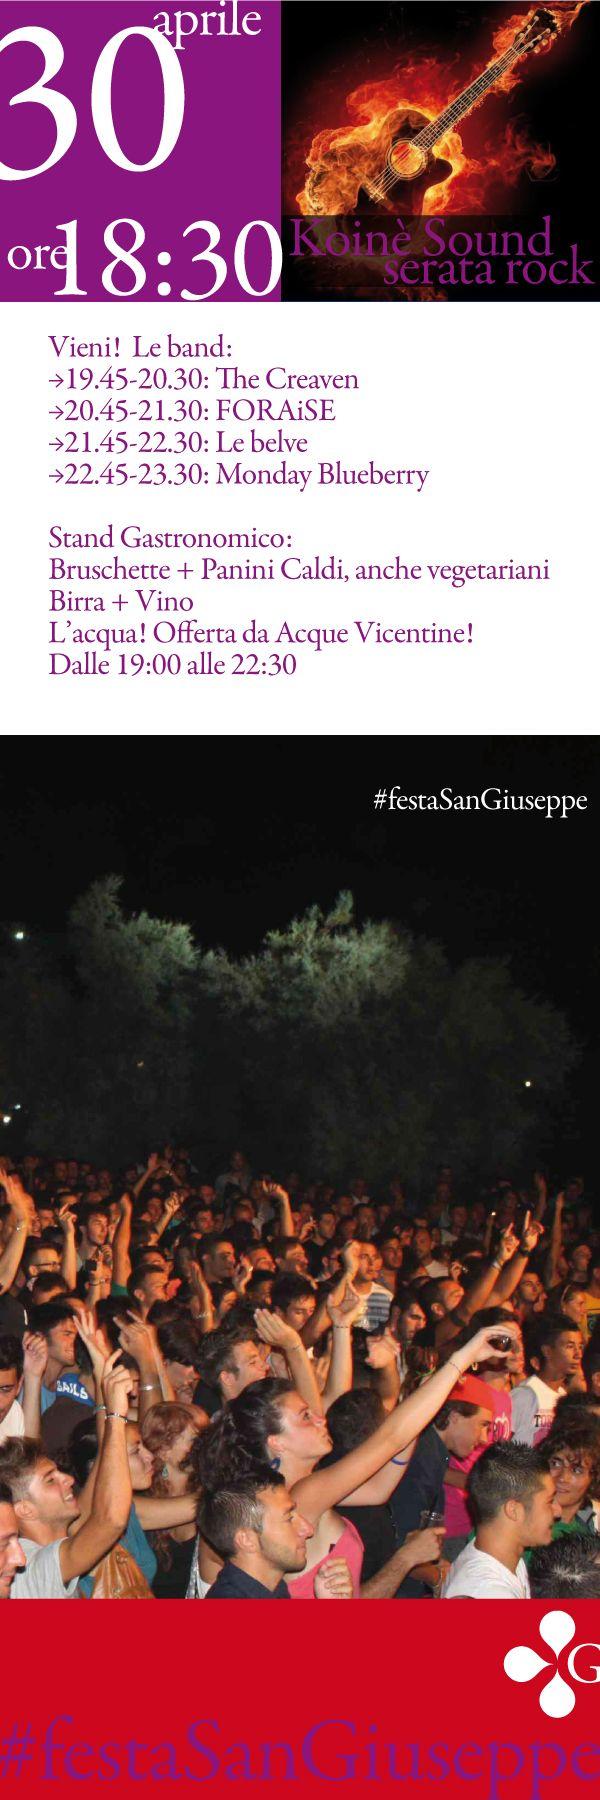 Vieni stasera a serata Rock #festaSanGiuseppe Vicenza. Koinè Sound.... e si mangia! Bruschette, Panini Caldi, anche vegetariani. fb.me/3IYOoIk2m